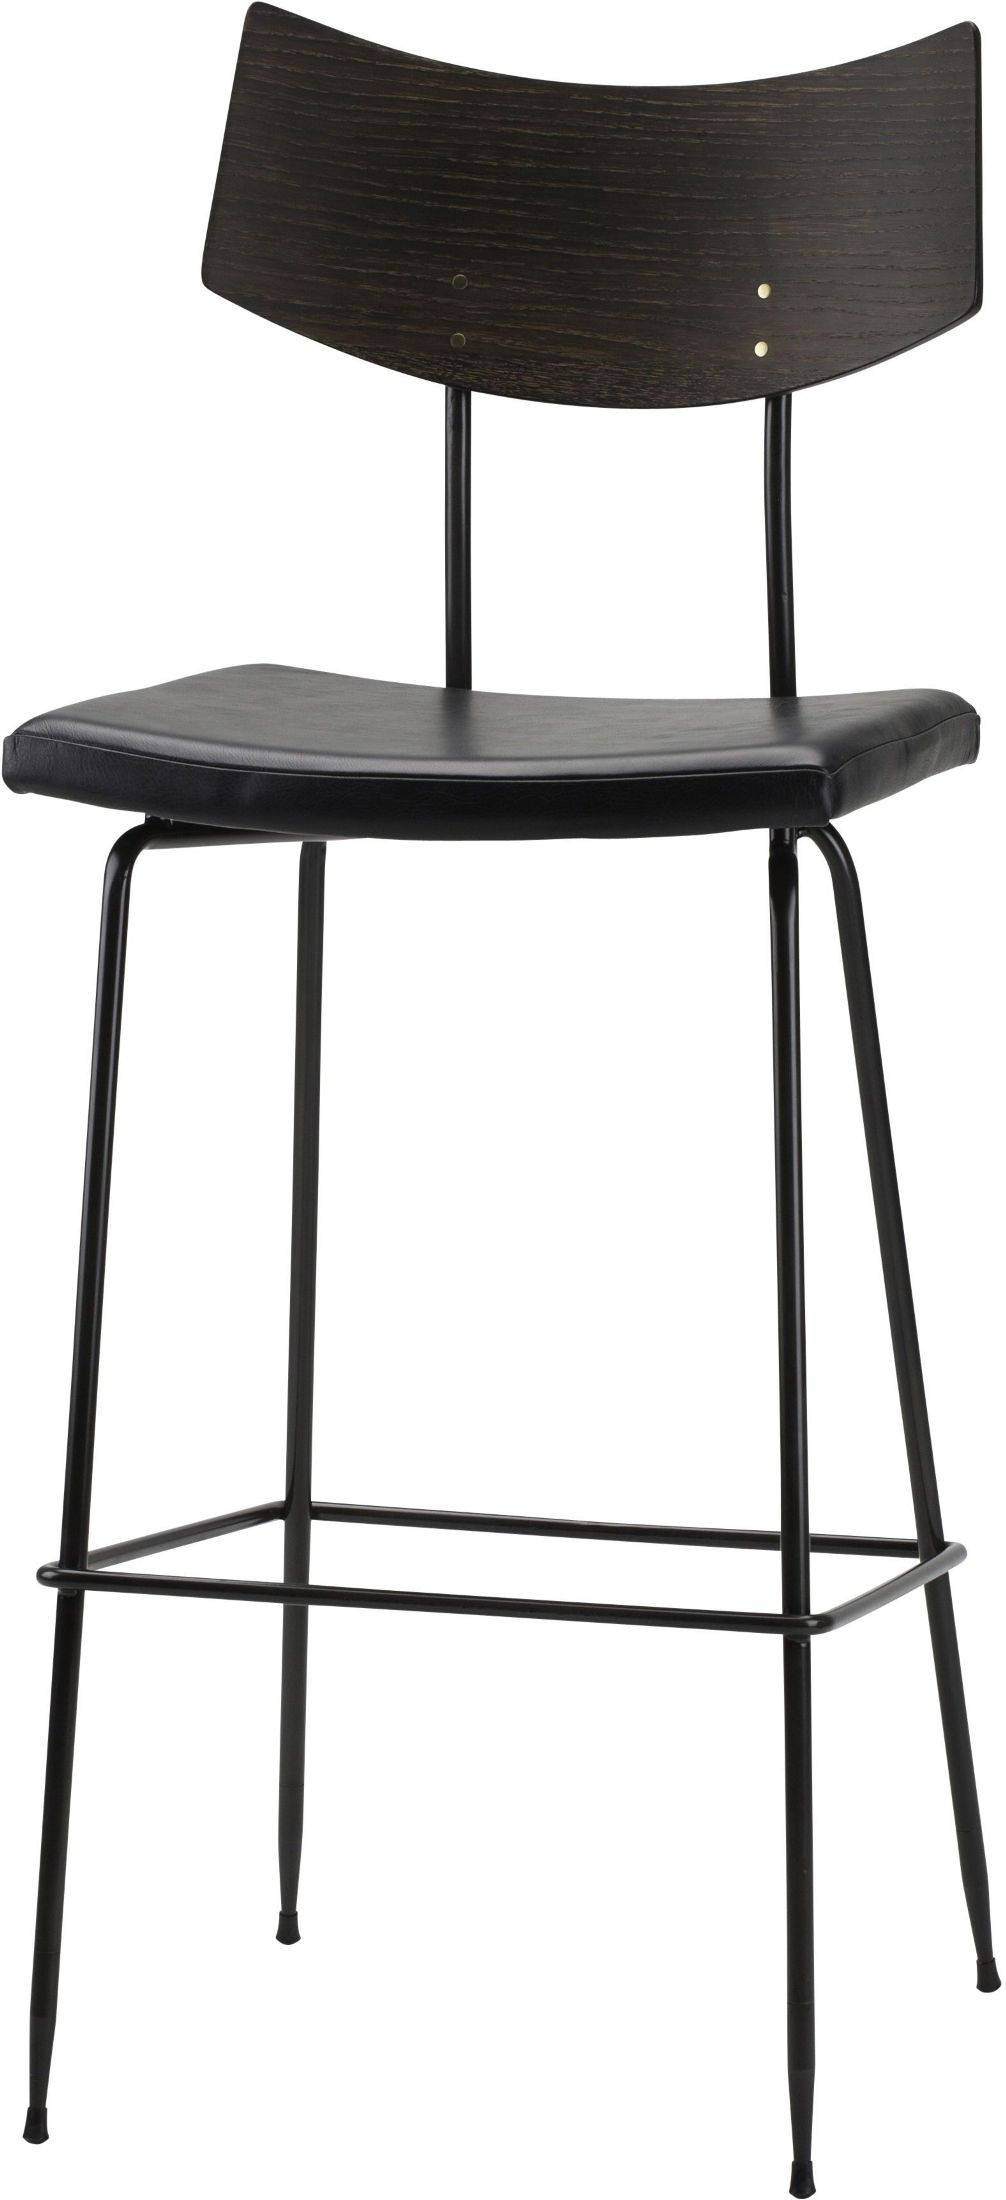 Soli Black Bar Stool From Nuevo Coleman Furniture